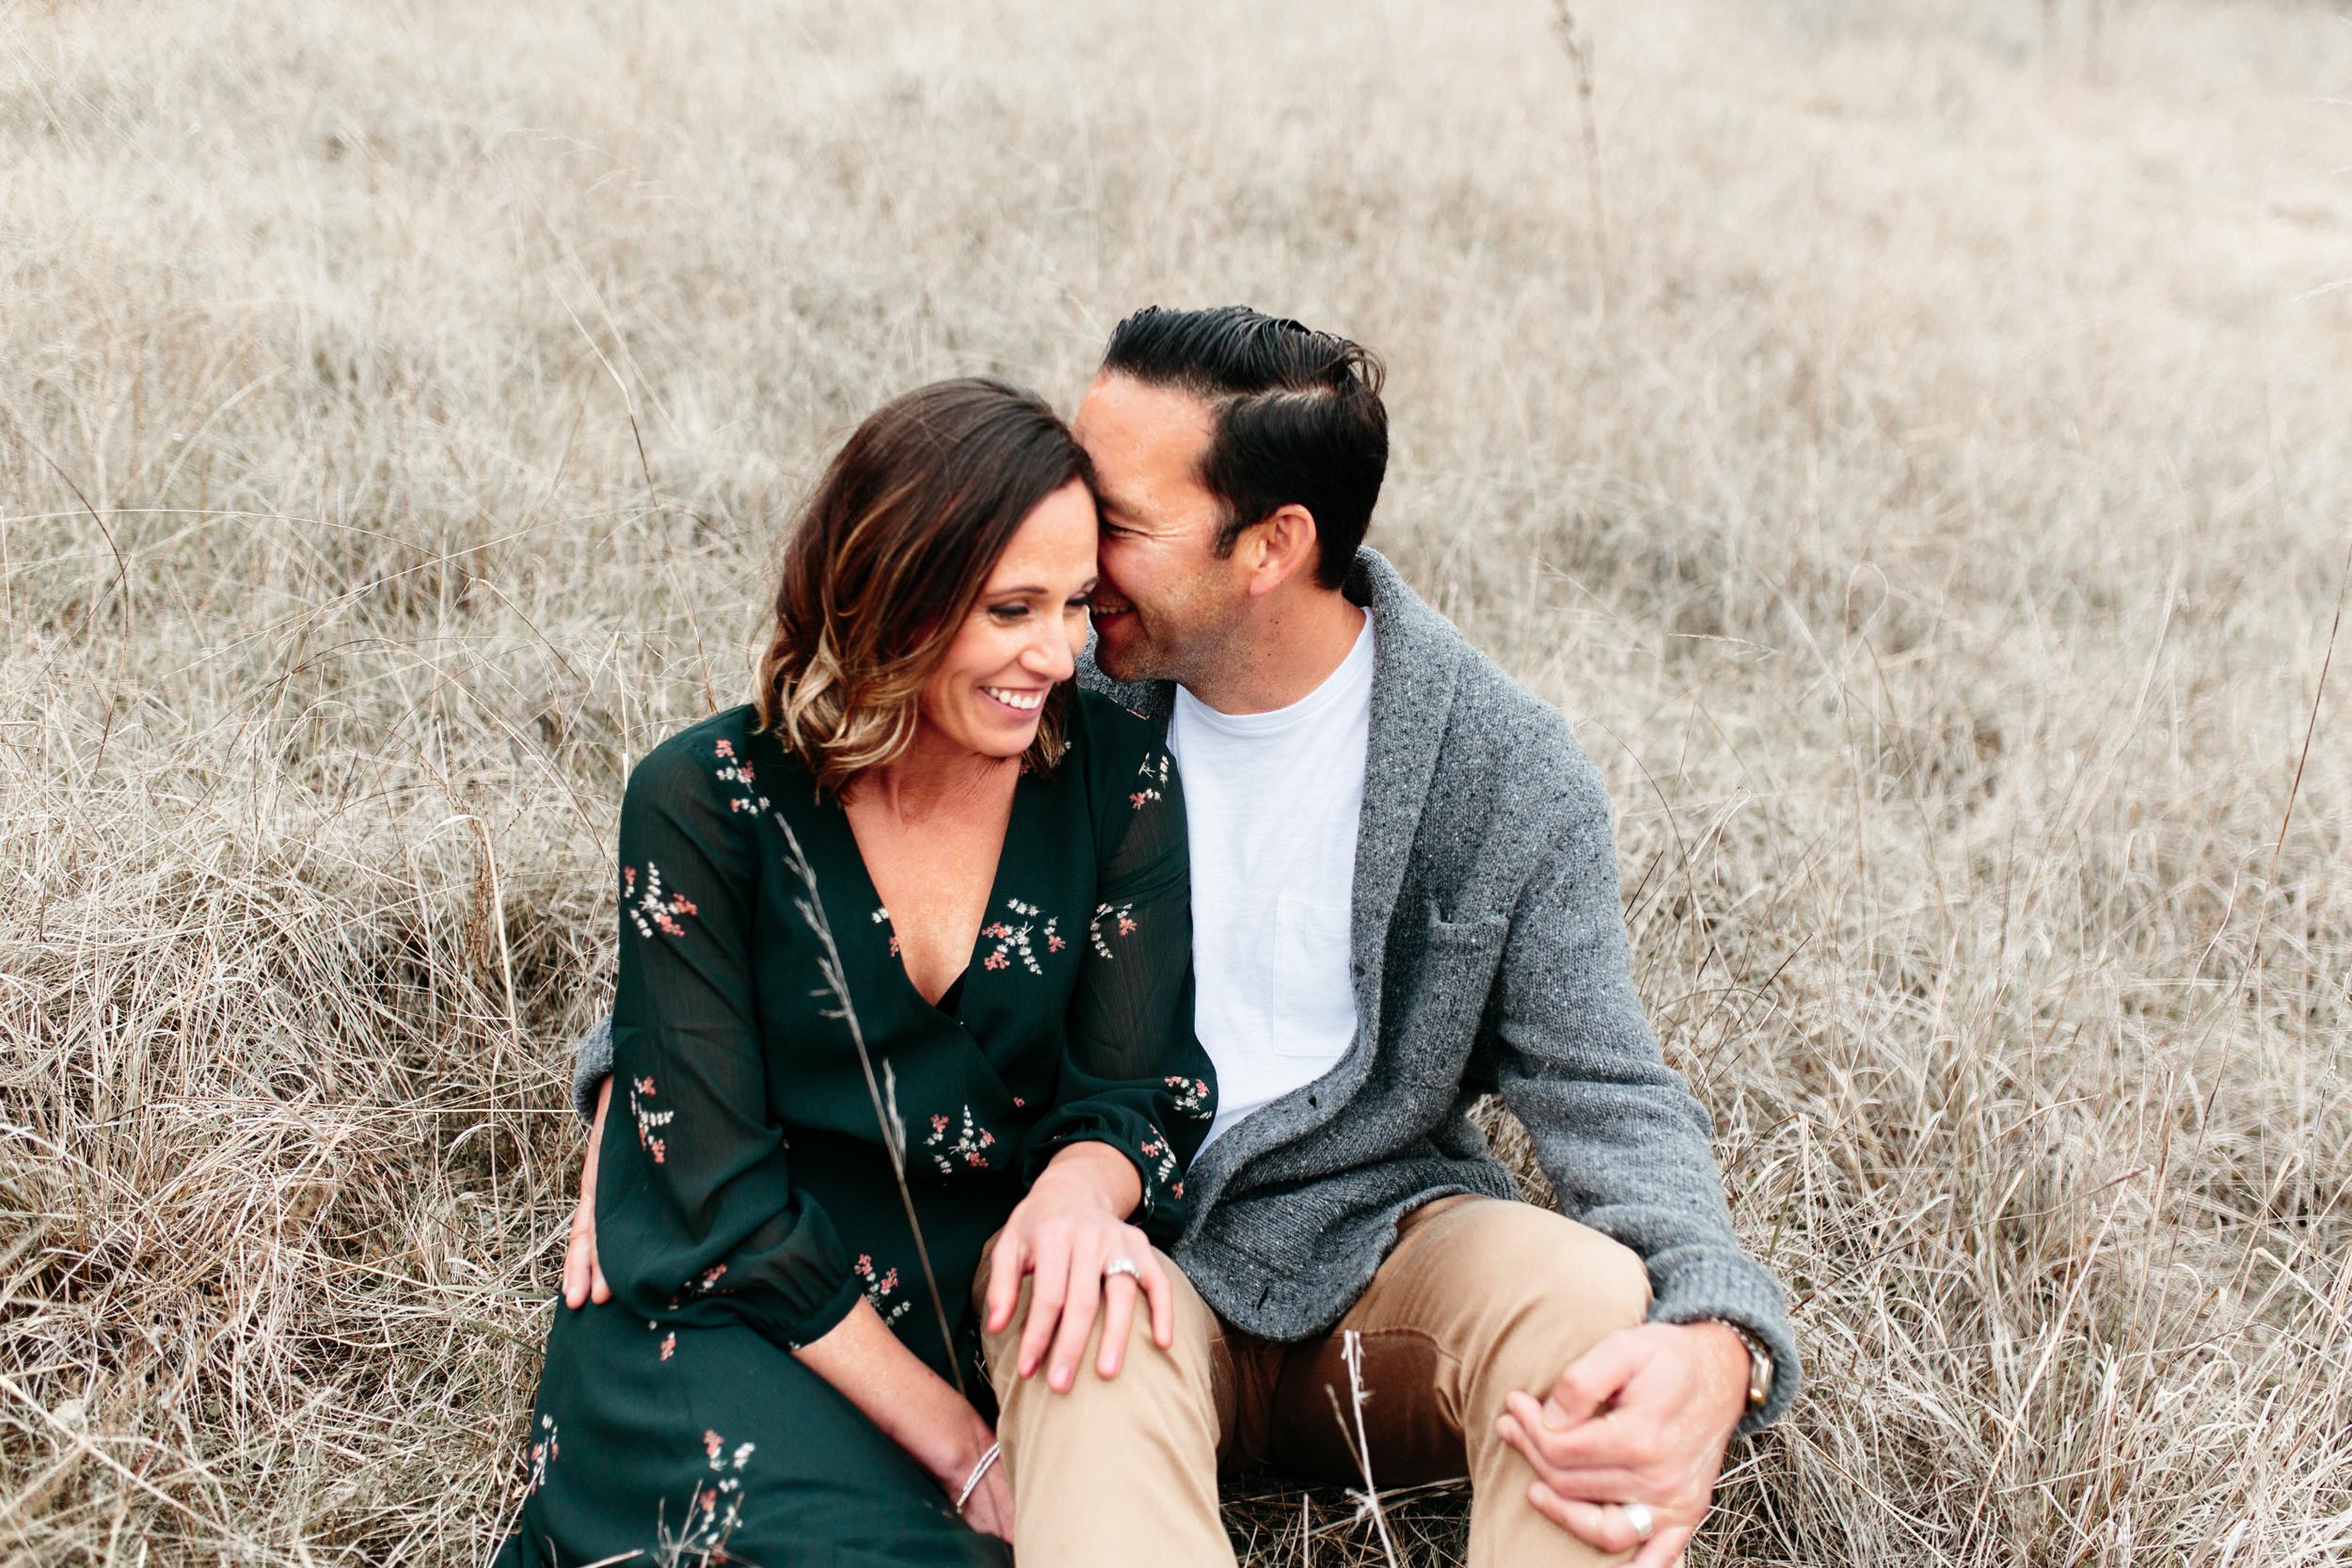 SamErica Studios - San Diego Photographer - Destination Wedding Photographer-34.jpg